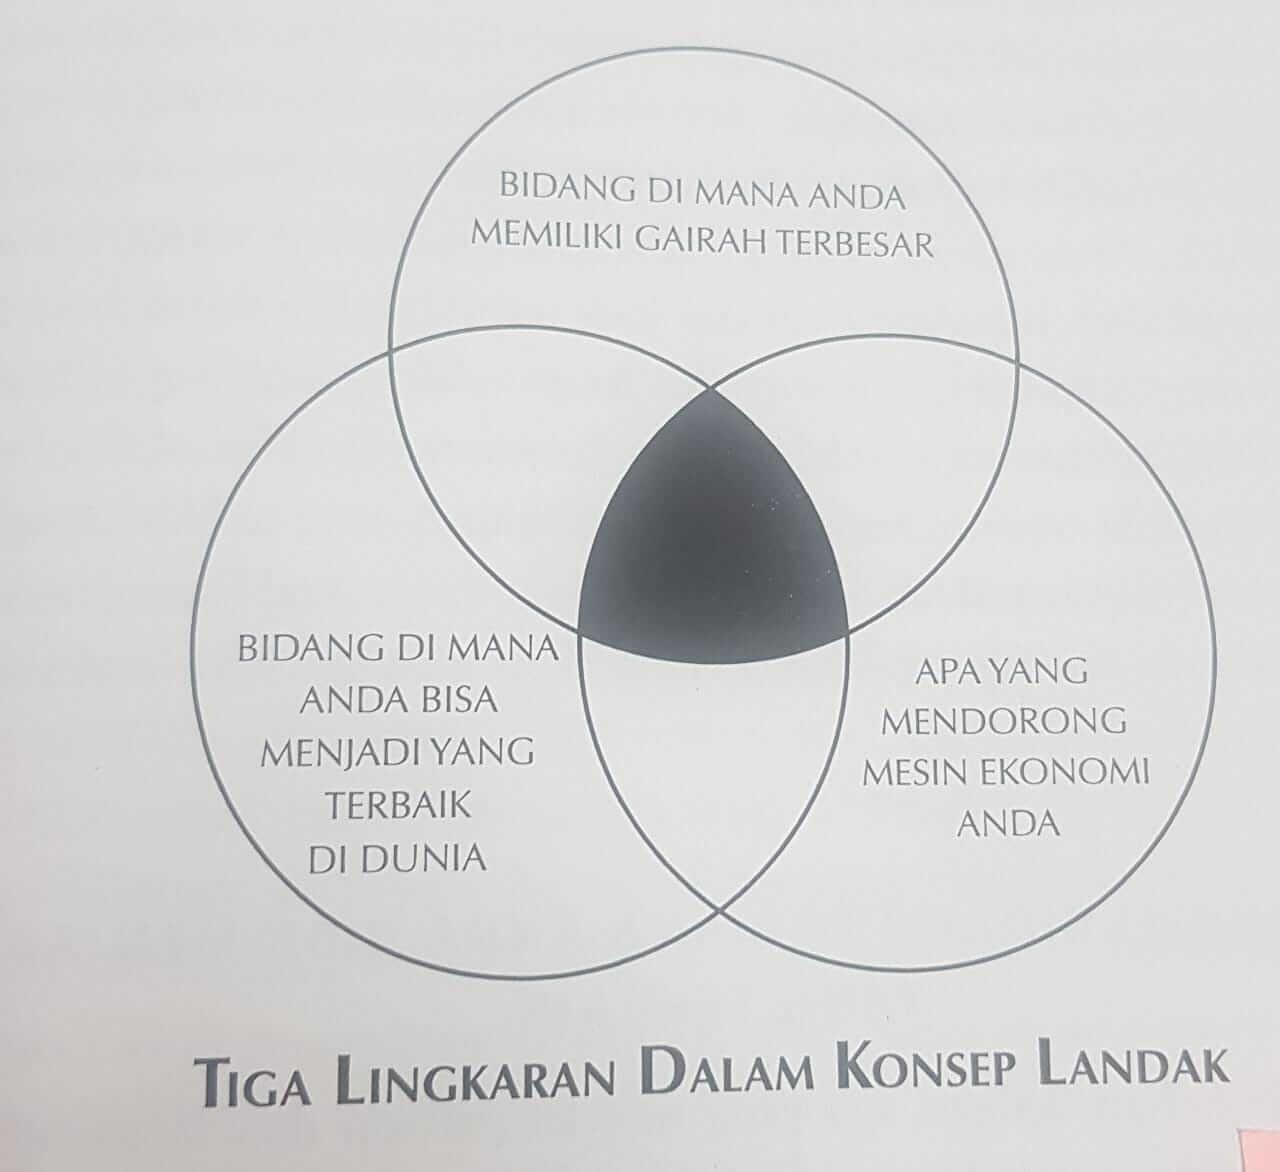 tiga lingkaran dalam konsep landak, perlu dipraktekkan